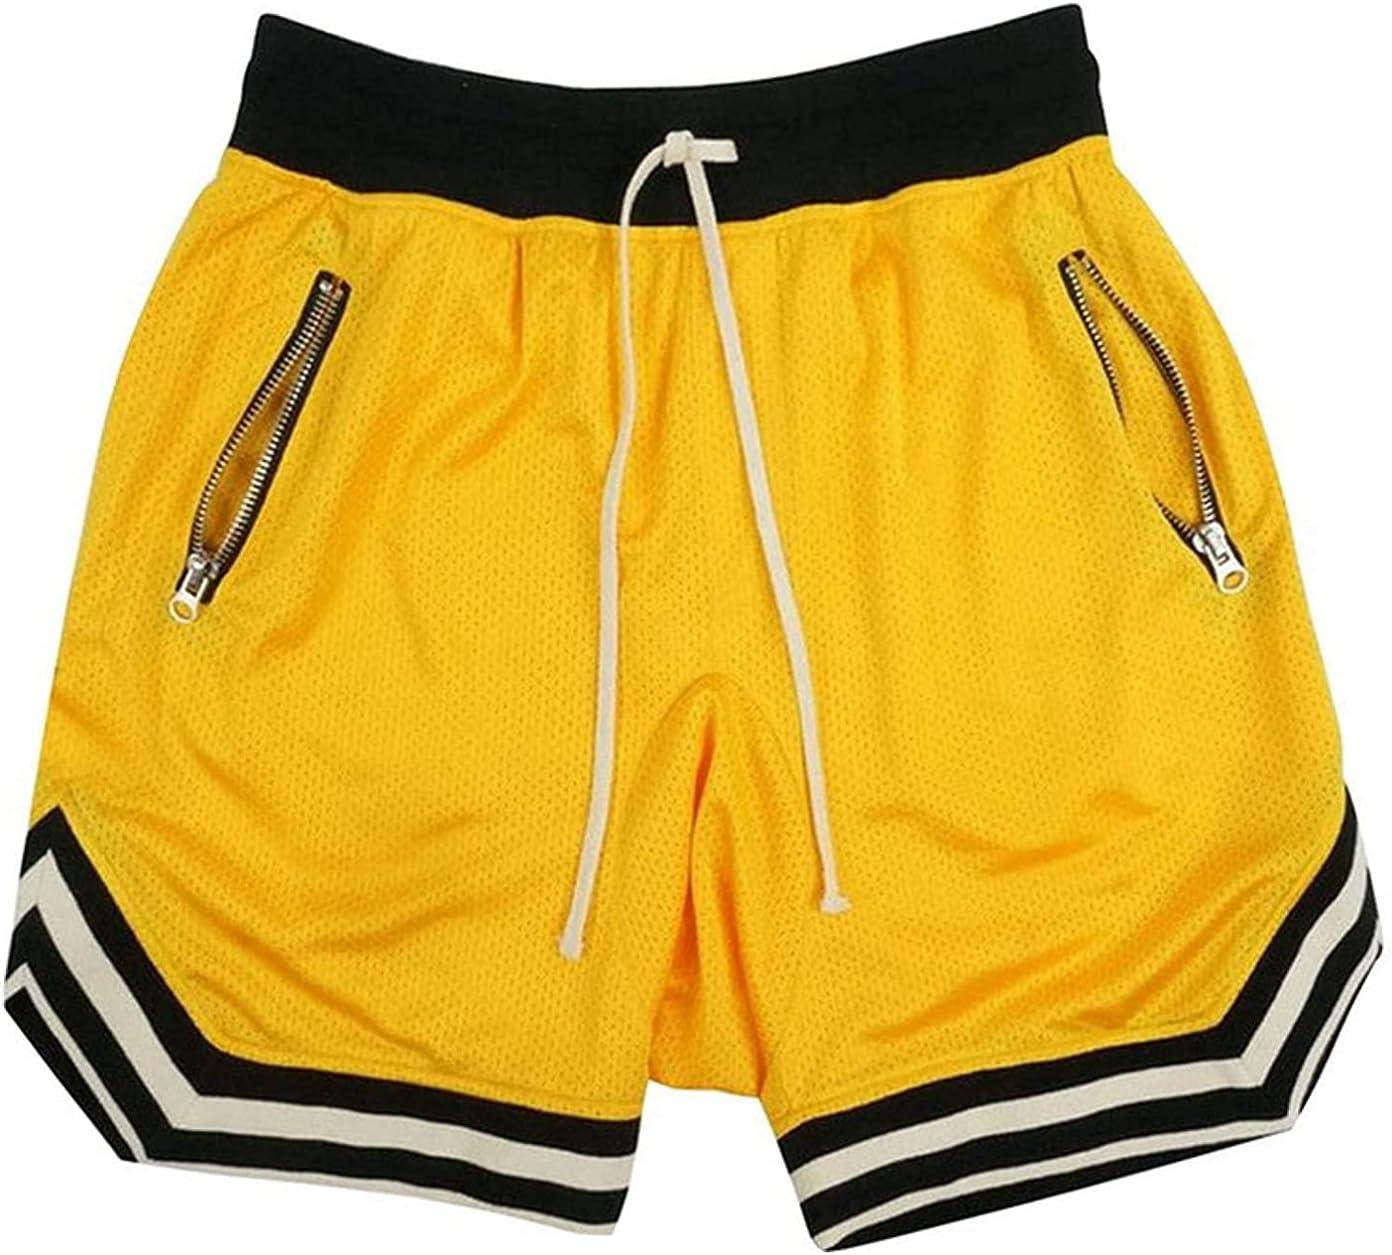 Mens Fitness Mesh Quick Dry Shorts Basketball Zipper Pockets Drawstring Pants Bodybuilding Gym Training Short Pants (Yellow,X-Large)